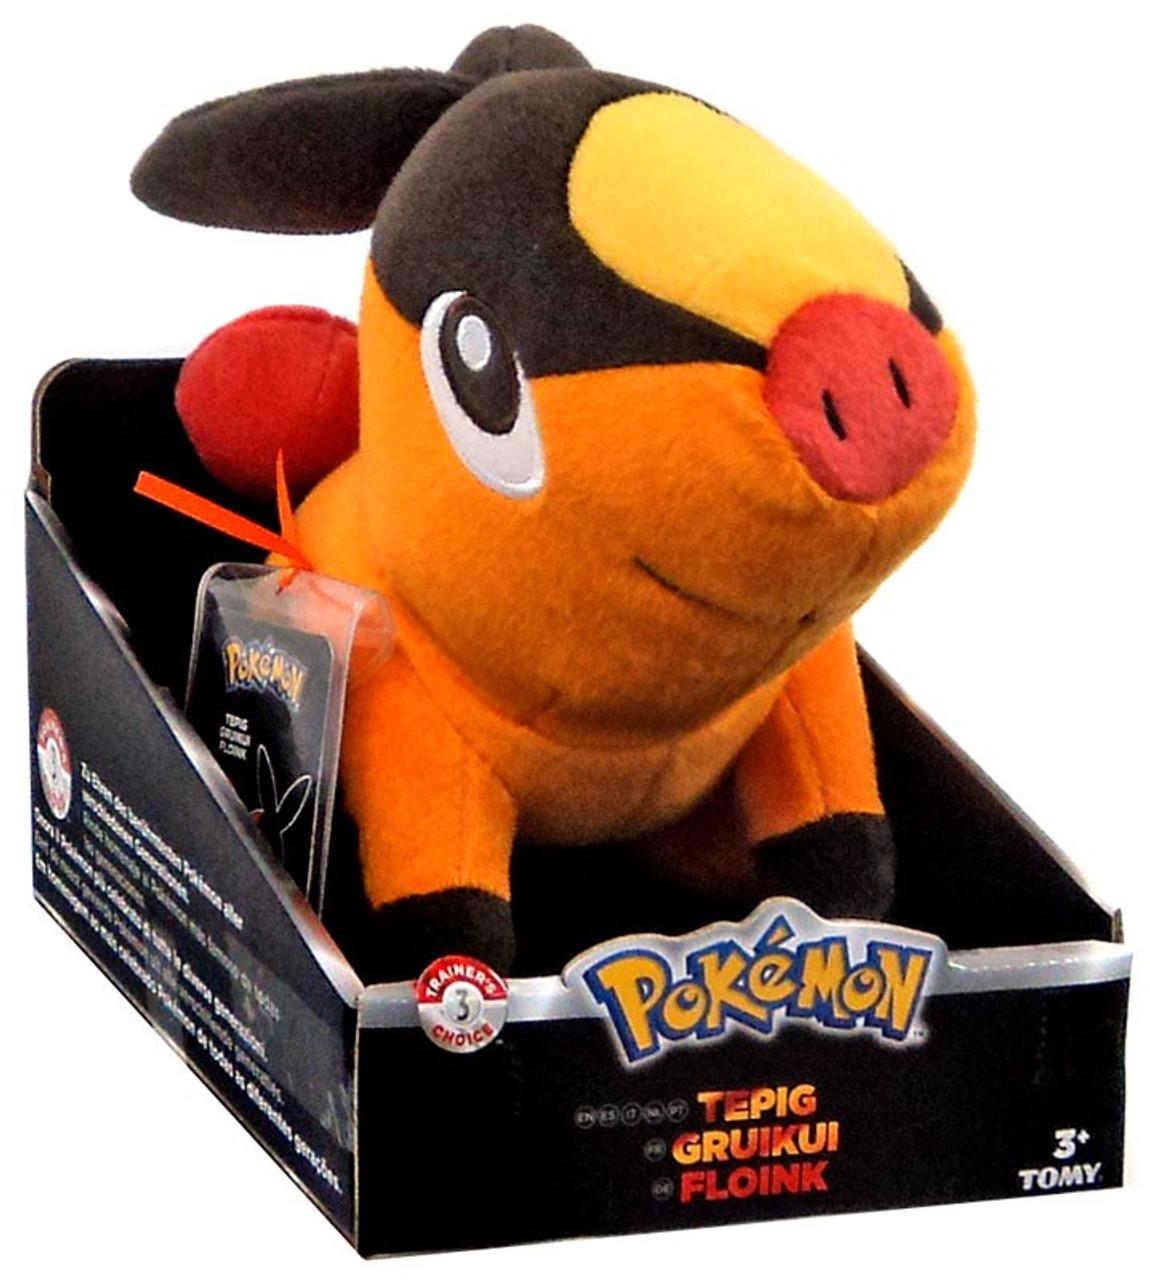 Pokemon TOMY Tepig 8-Inch Trainer's Choice Plush